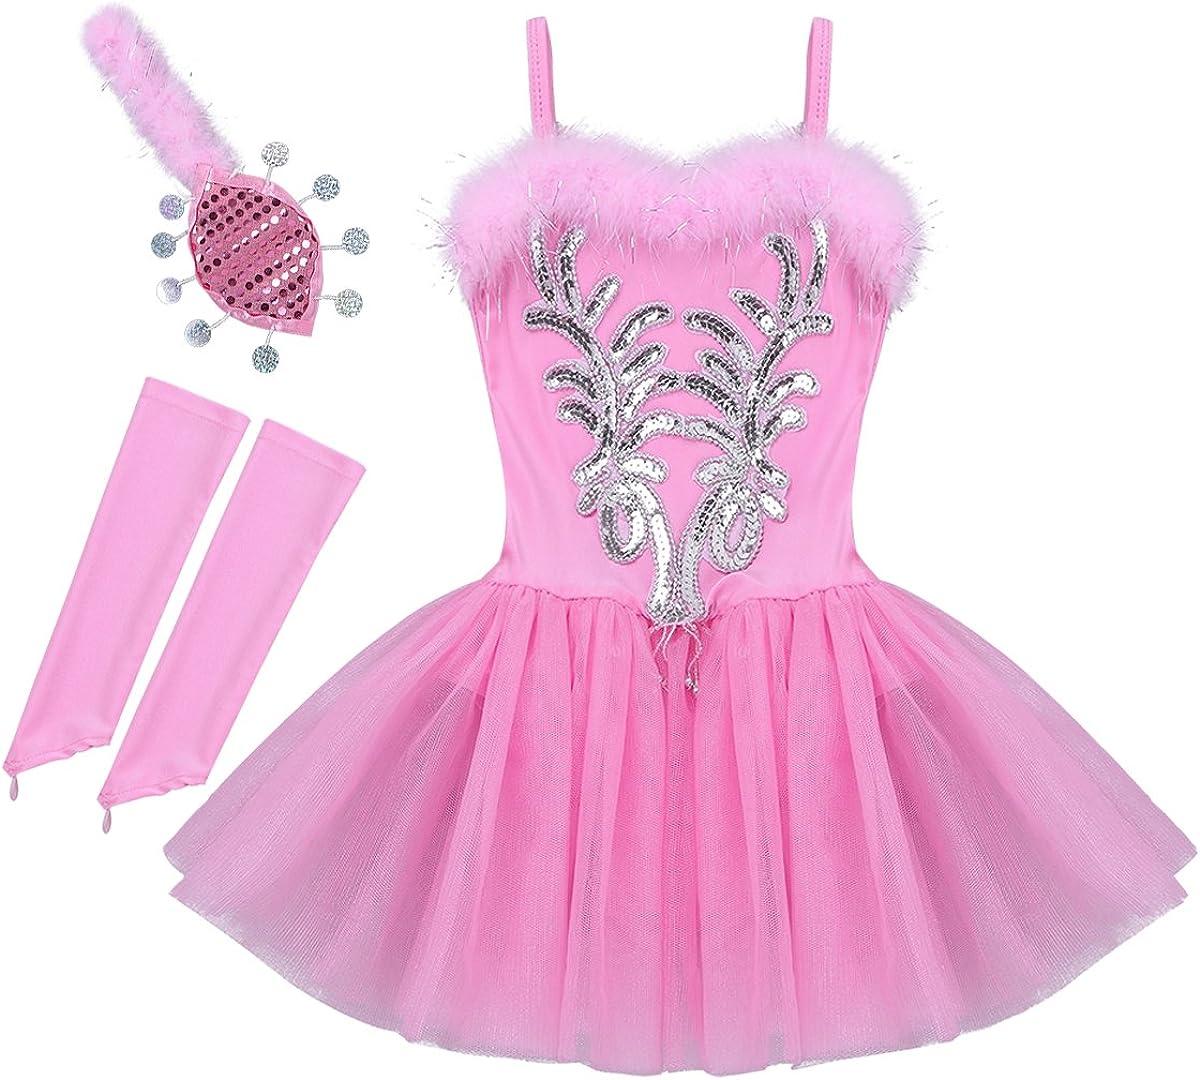 dPois Vestido Maillot de Ballet Danza para Niña Tutú Ballet Princesa Vestido Lentejuelas Brillantes + Guantes + Clip Vestido de Patinaje Artistico Disfraz Traje Bailarina